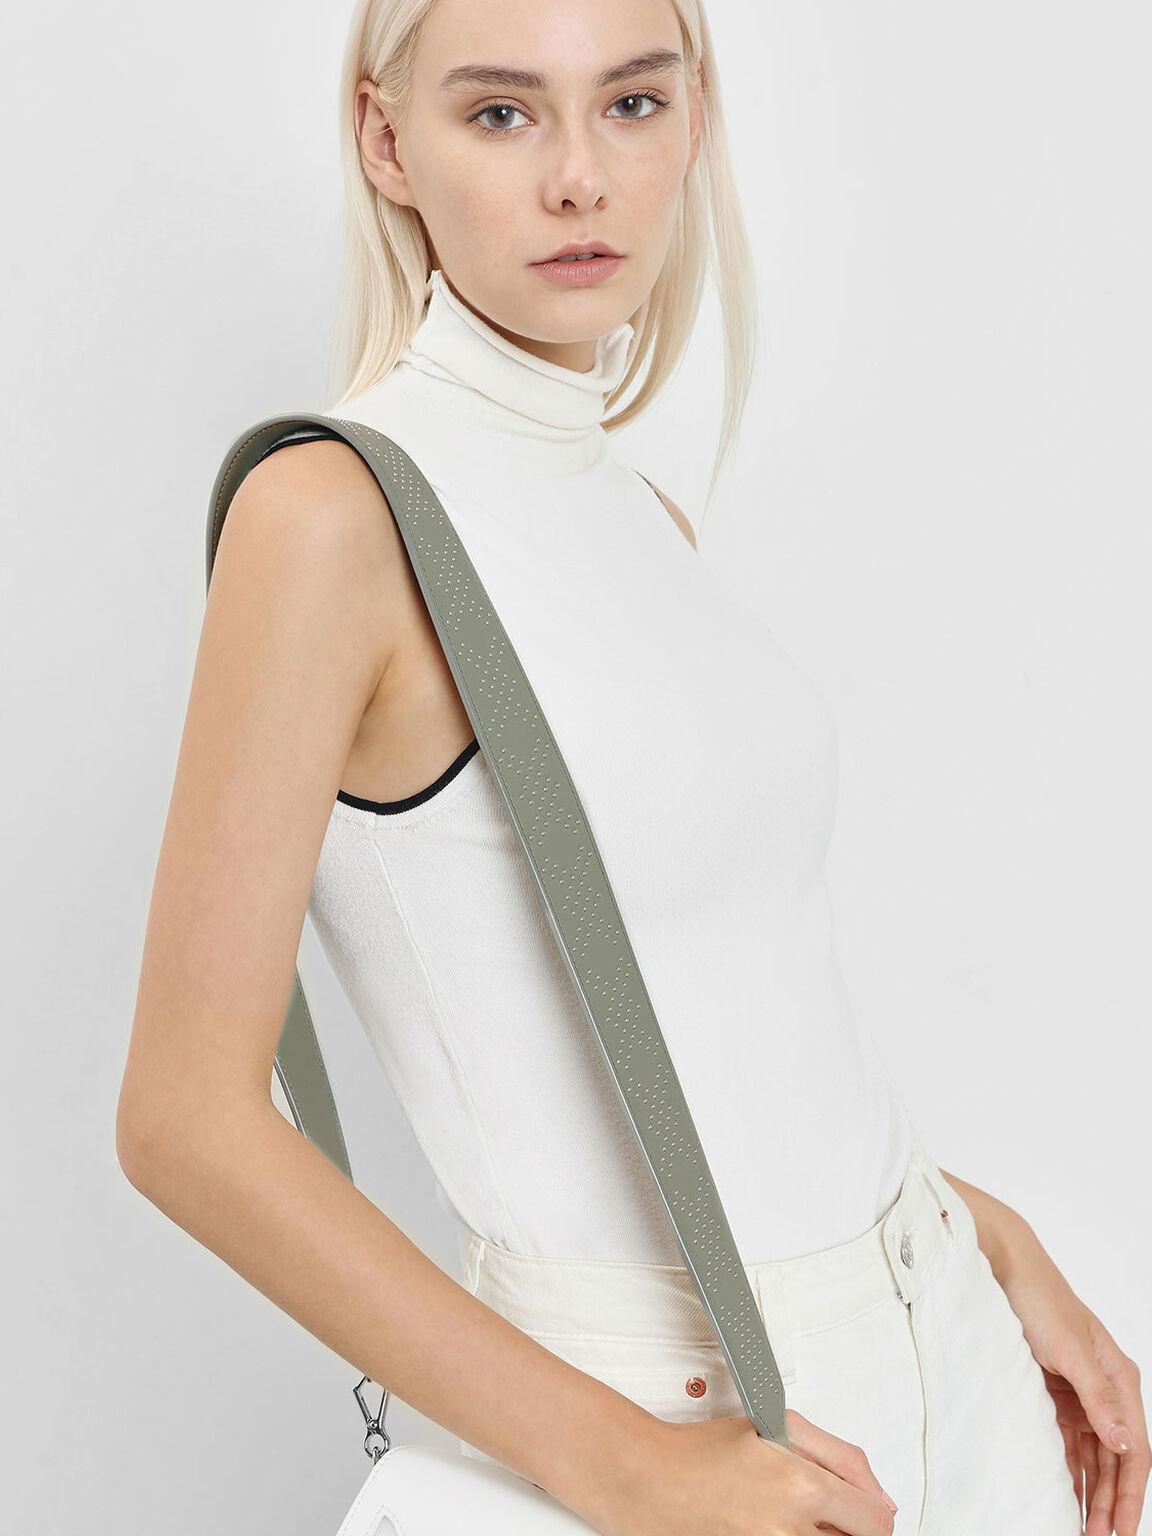 Double X Print Bag Strap, Sage Green, hi-res